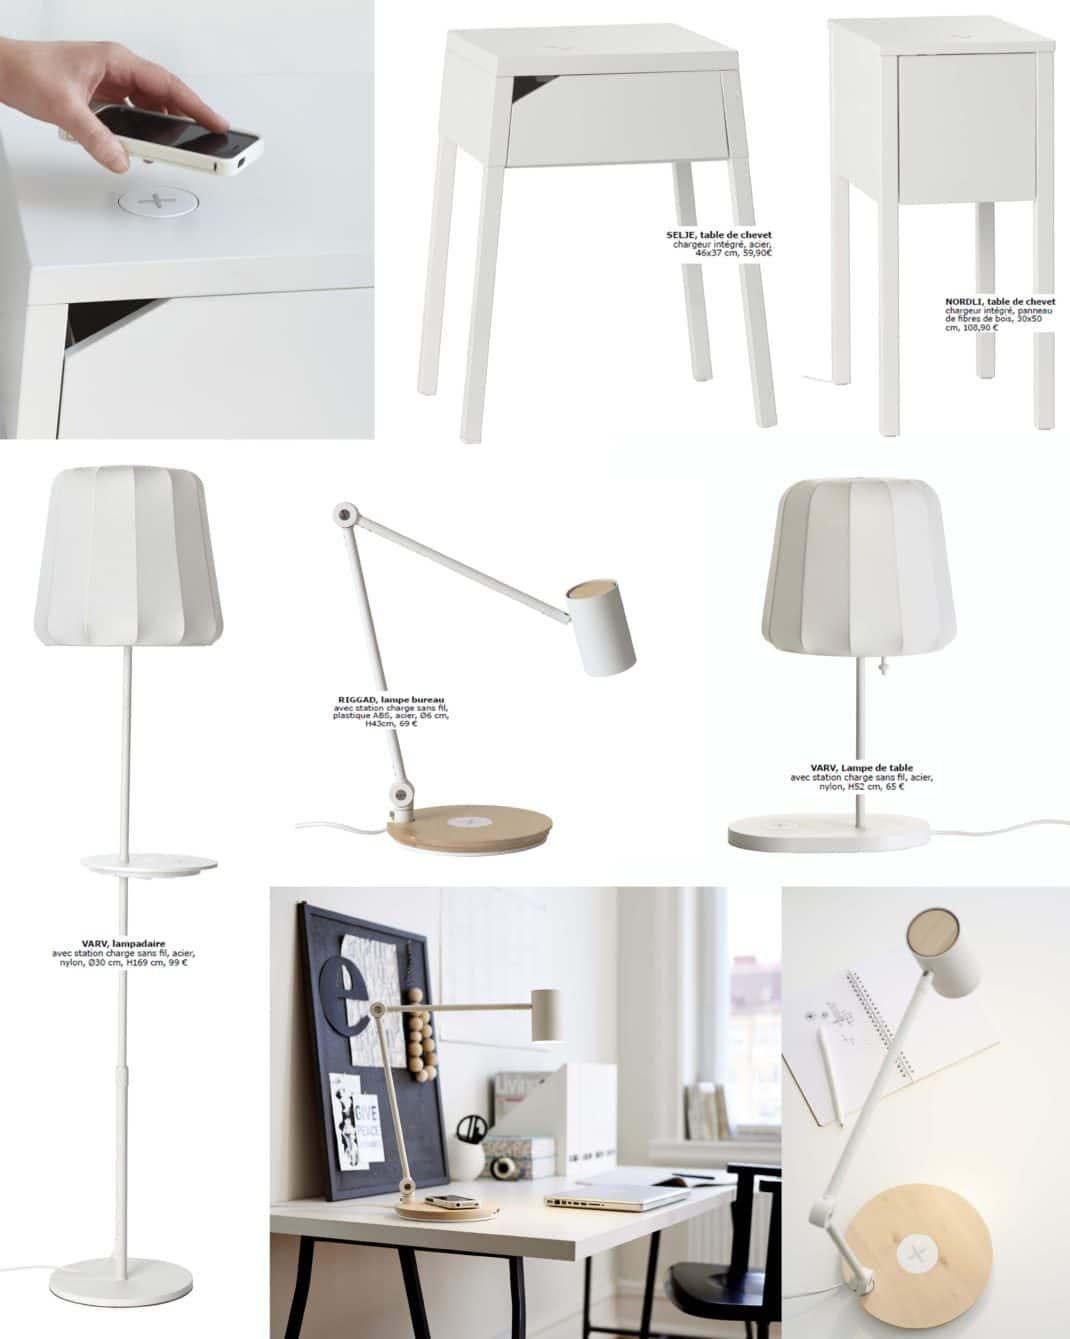 lampe de chevet ikea campagne with lampe de chevet ikea. Black Bedroom Furniture Sets. Home Design Ideas